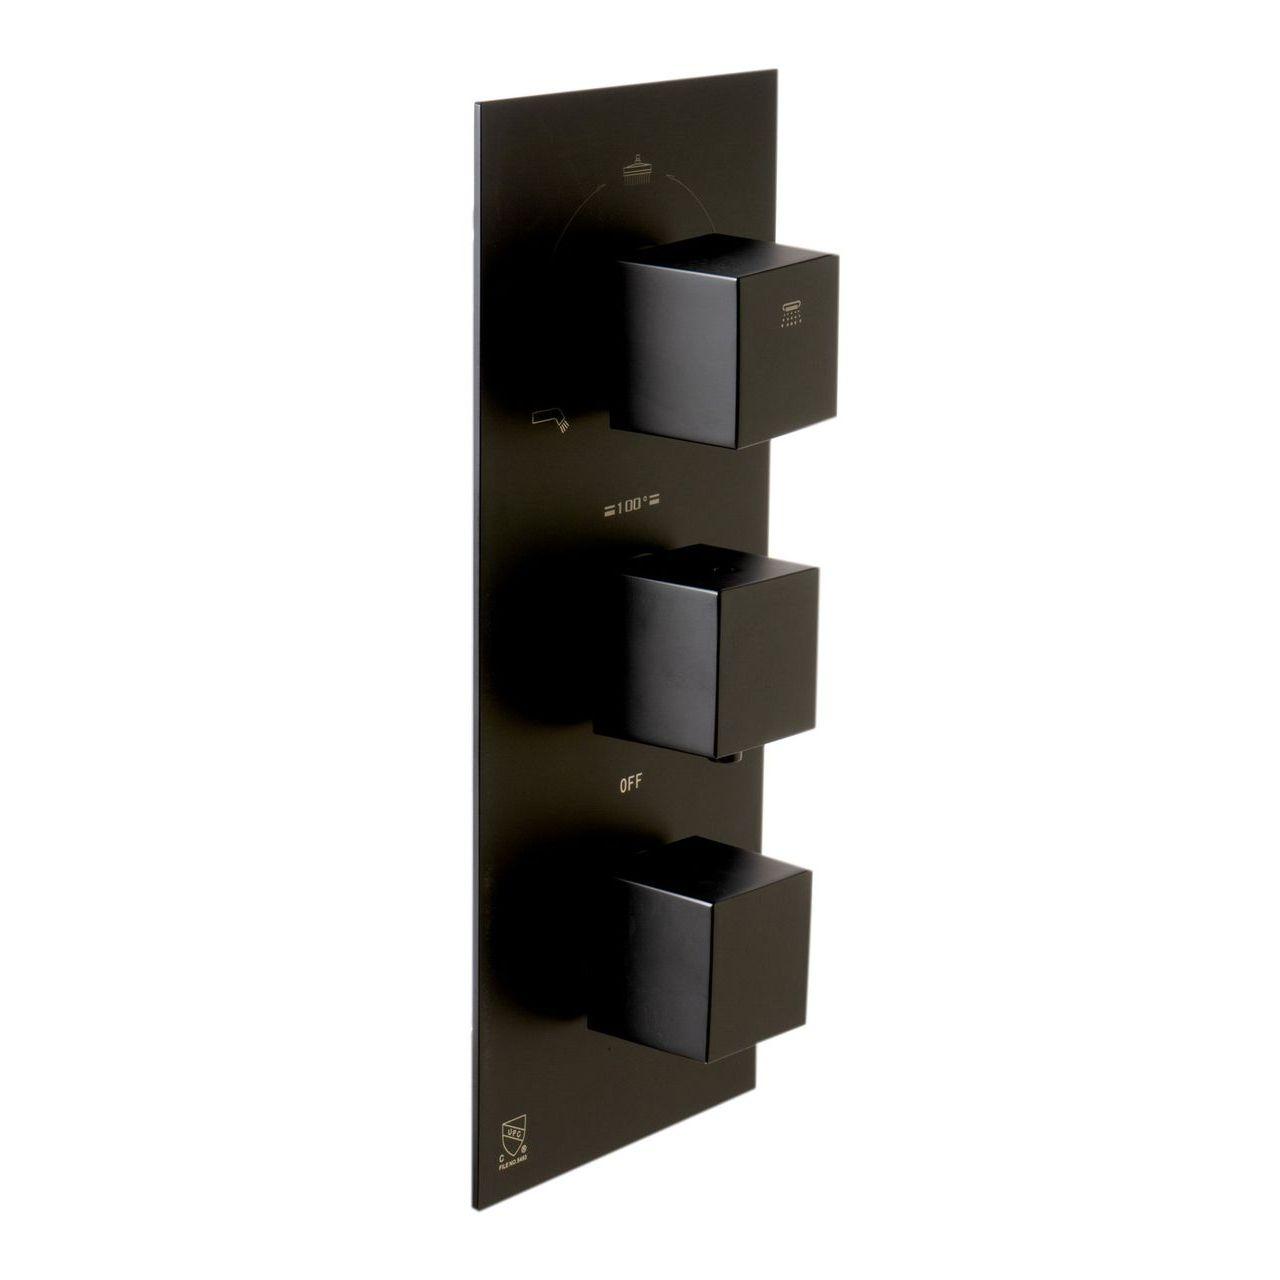 ALFI Black Matte 3-Way Thermostatic Valve Shower Mixer Square Knobs